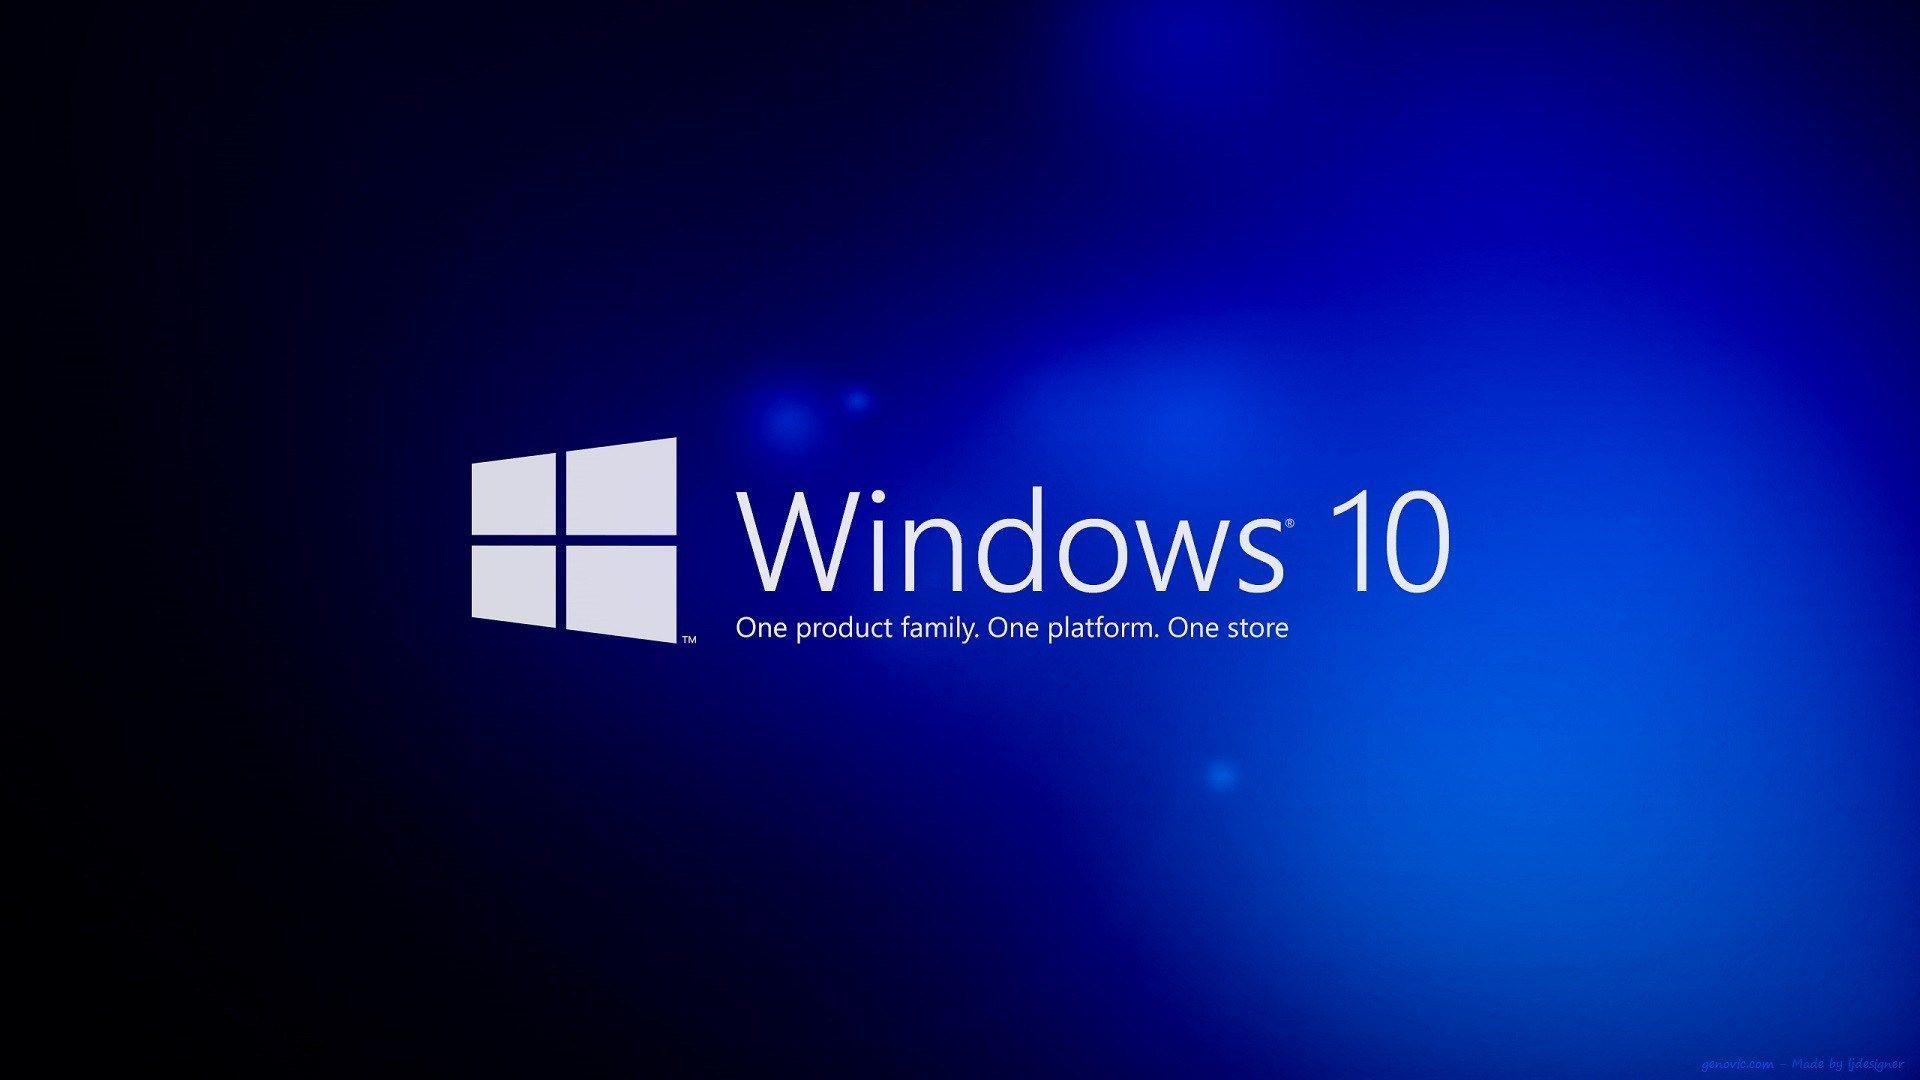 Cool Background Windows 10